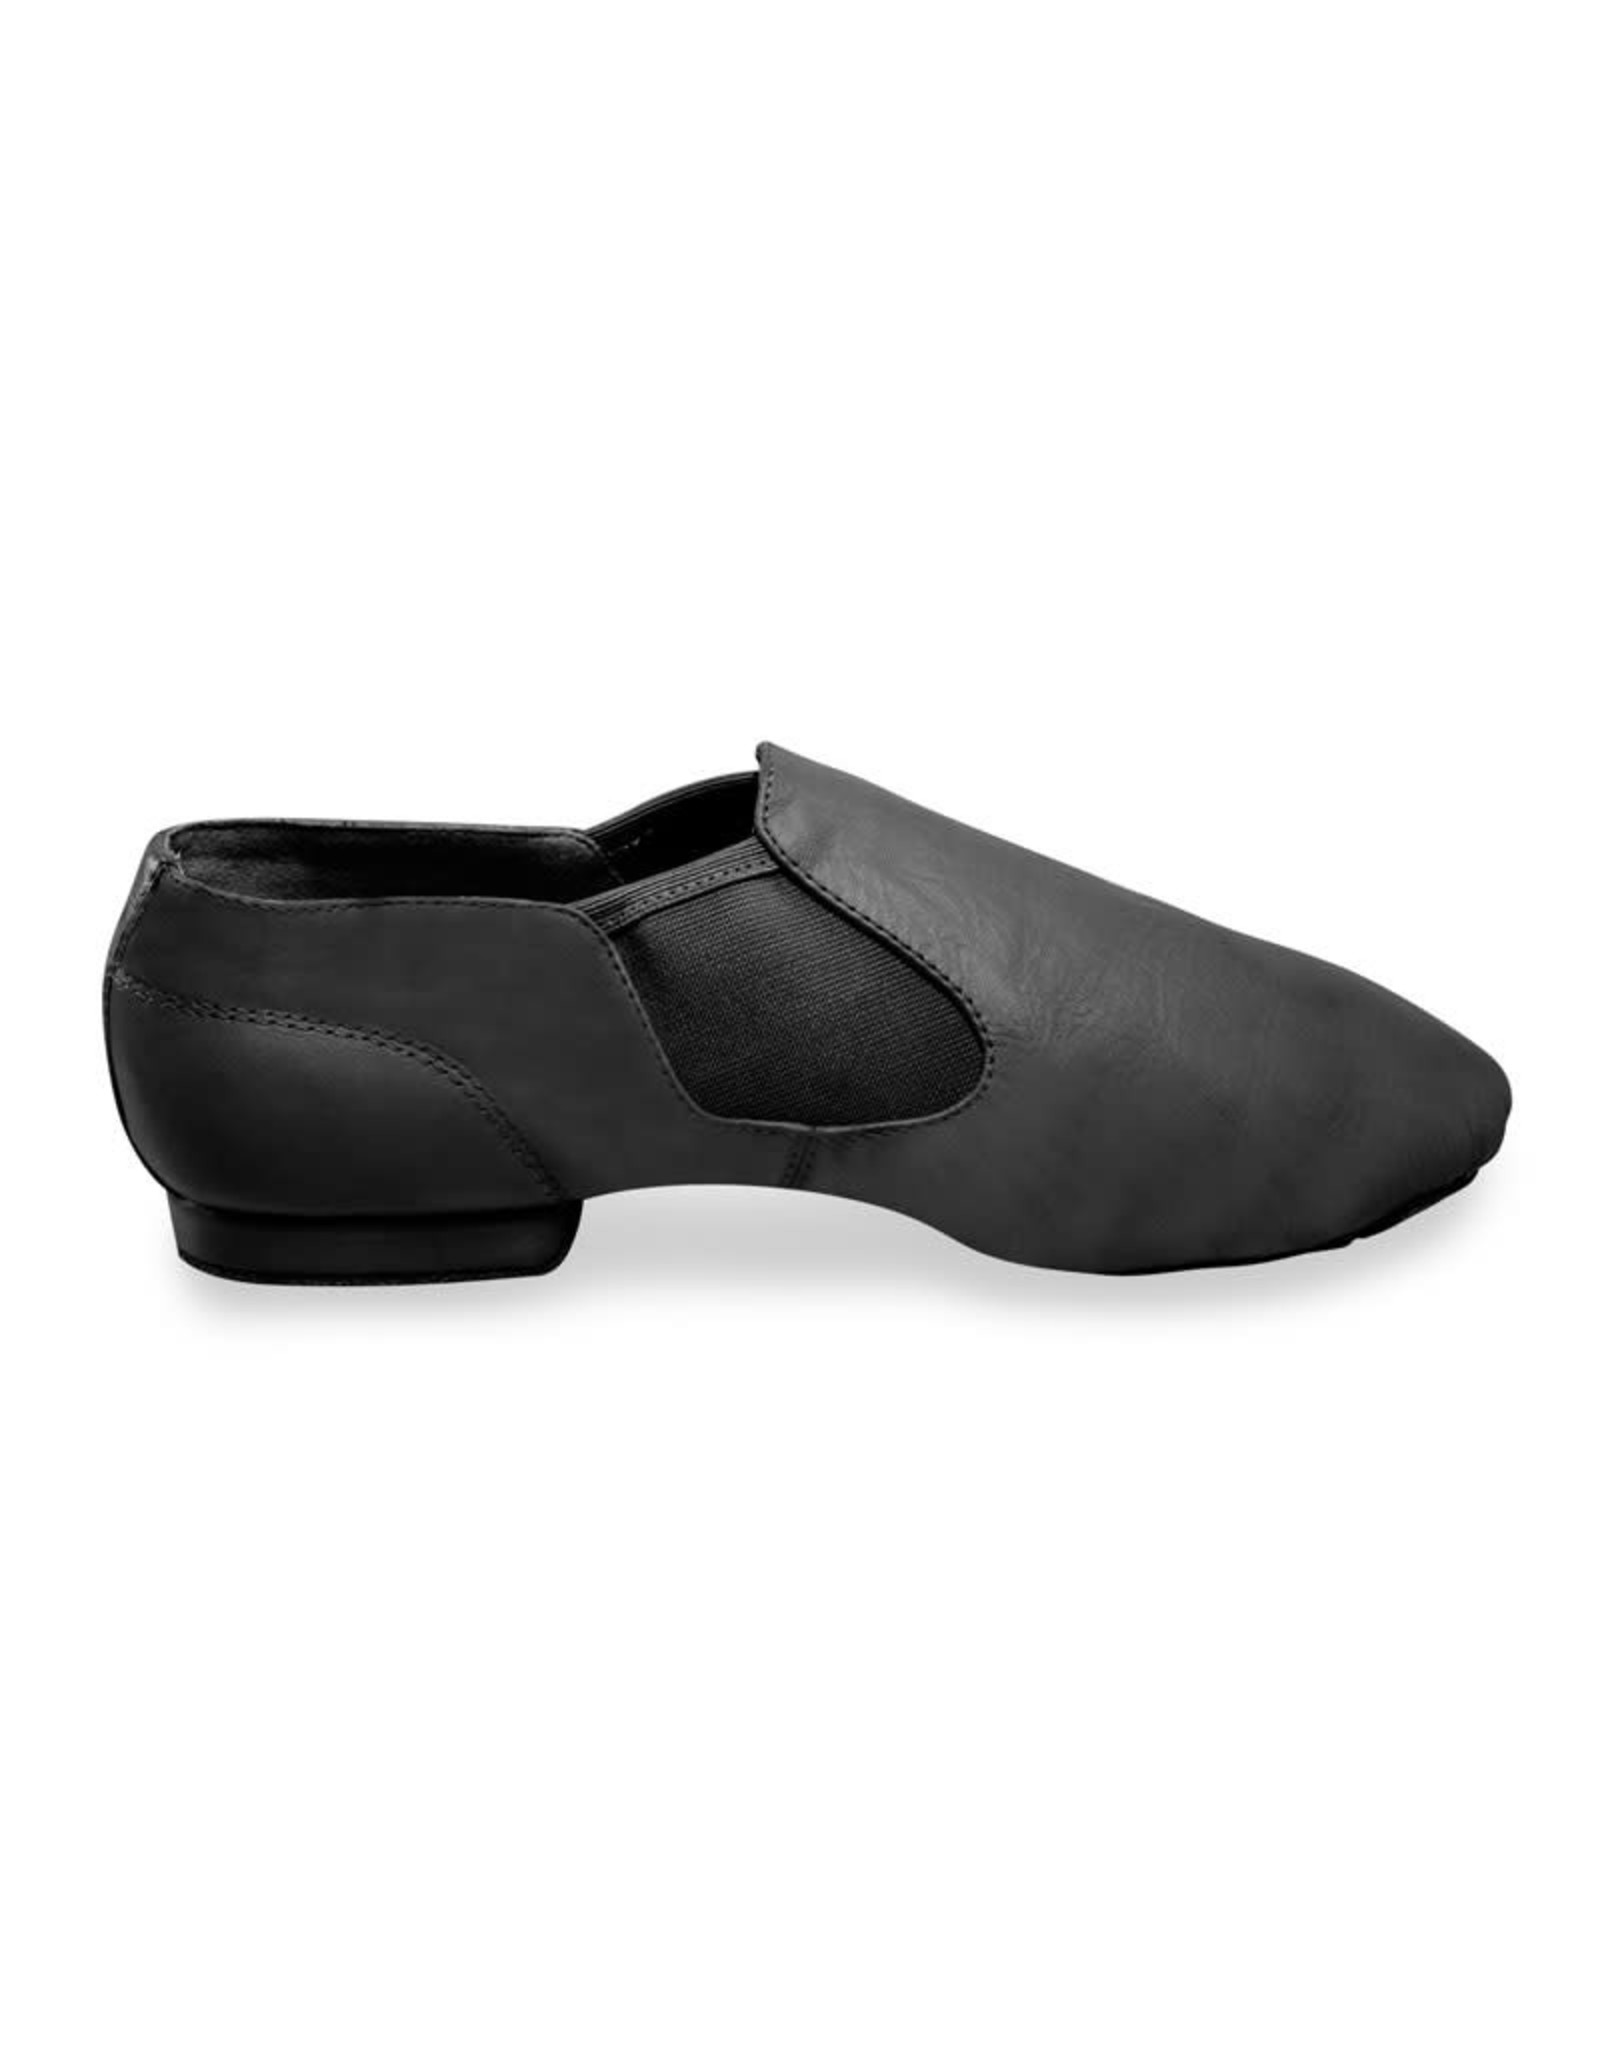 Sansha Moderno Shoes JS32